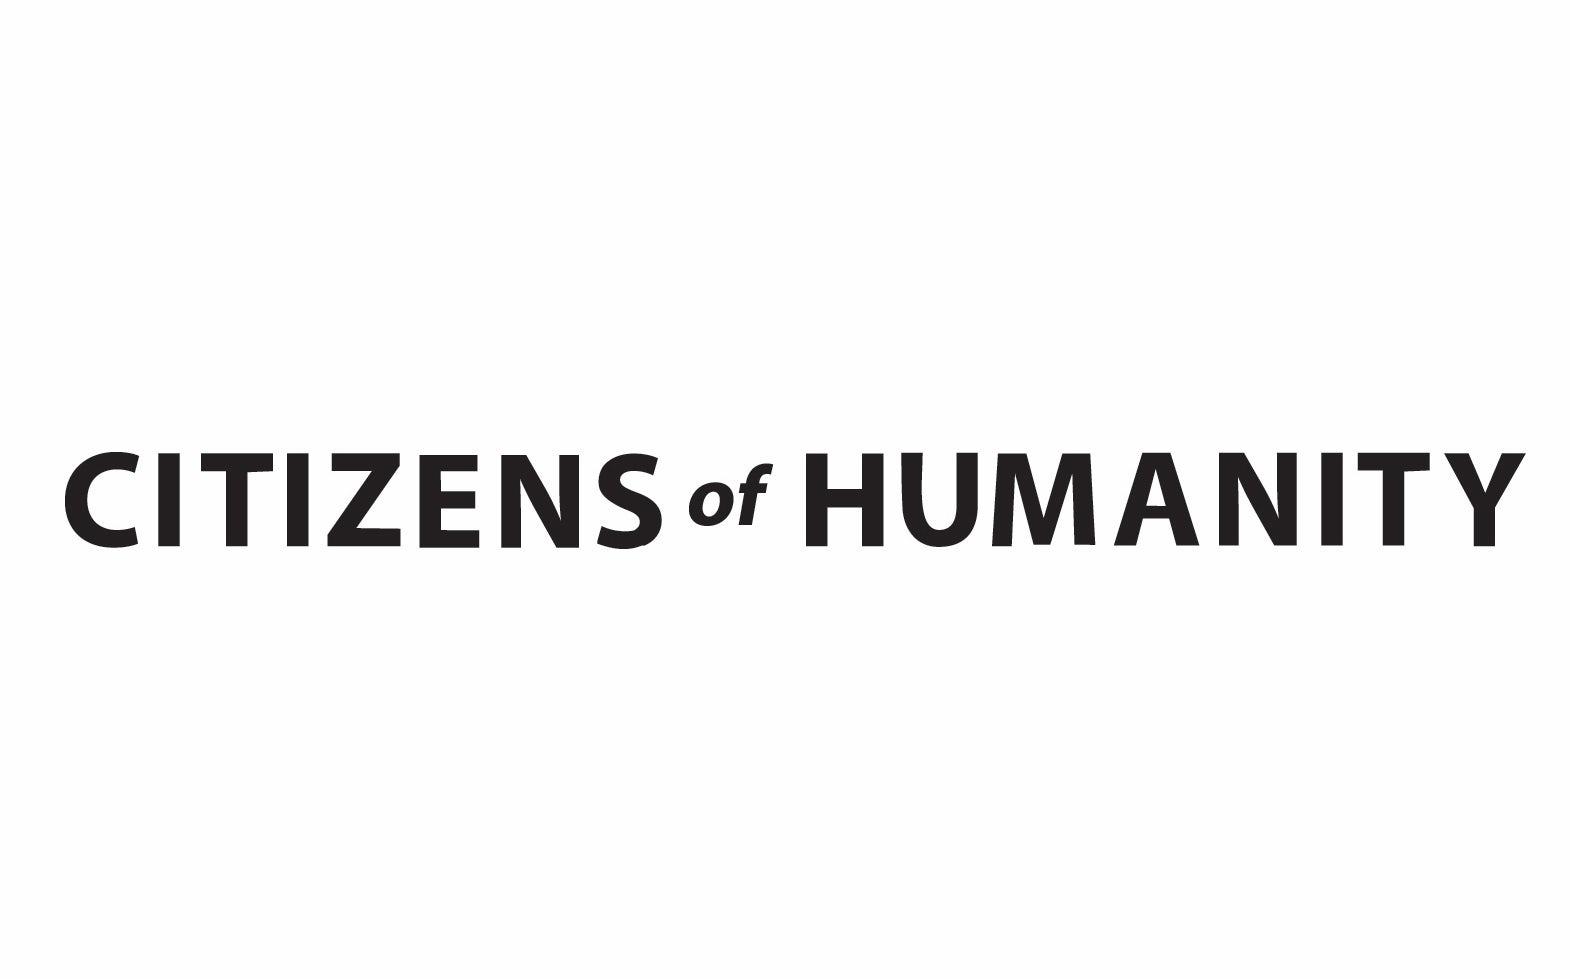 Citizens of Humanity company logo